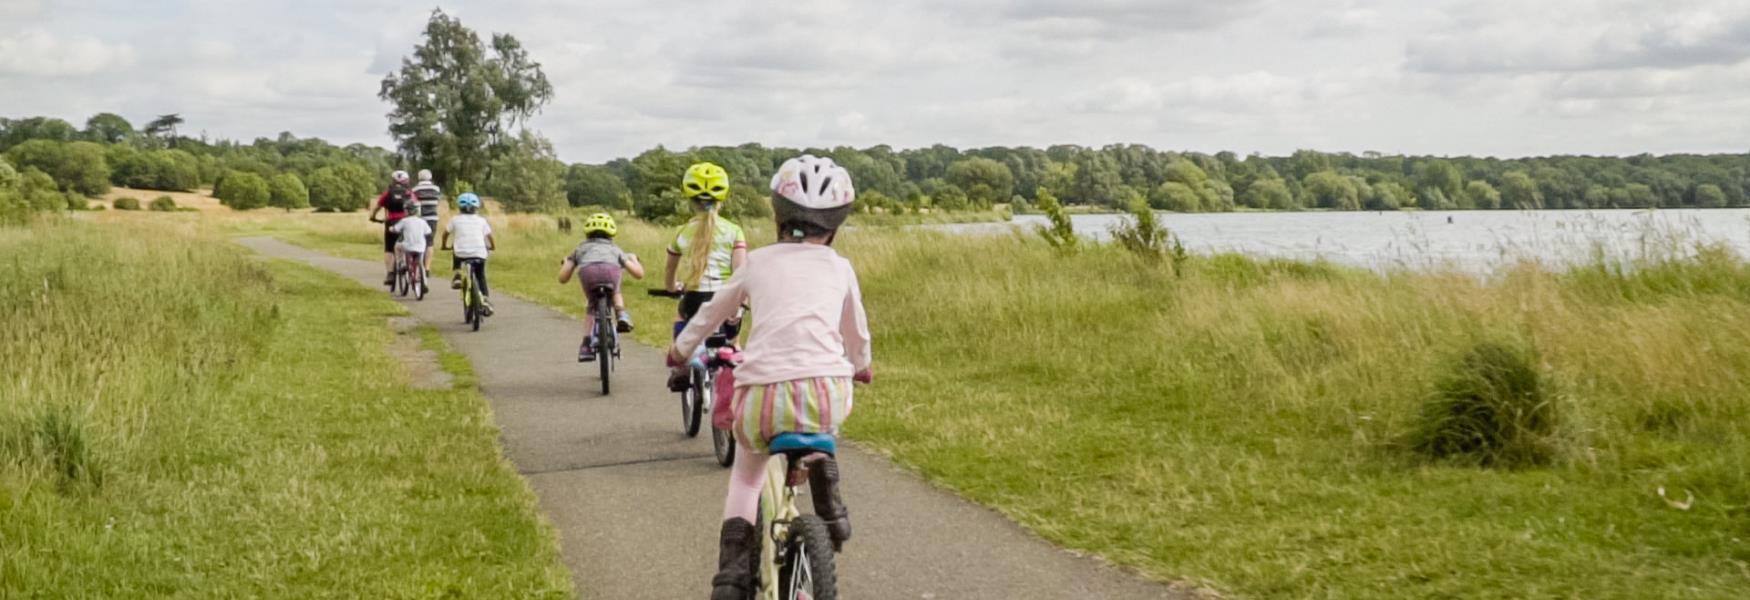 A family cycling around Nene Park.